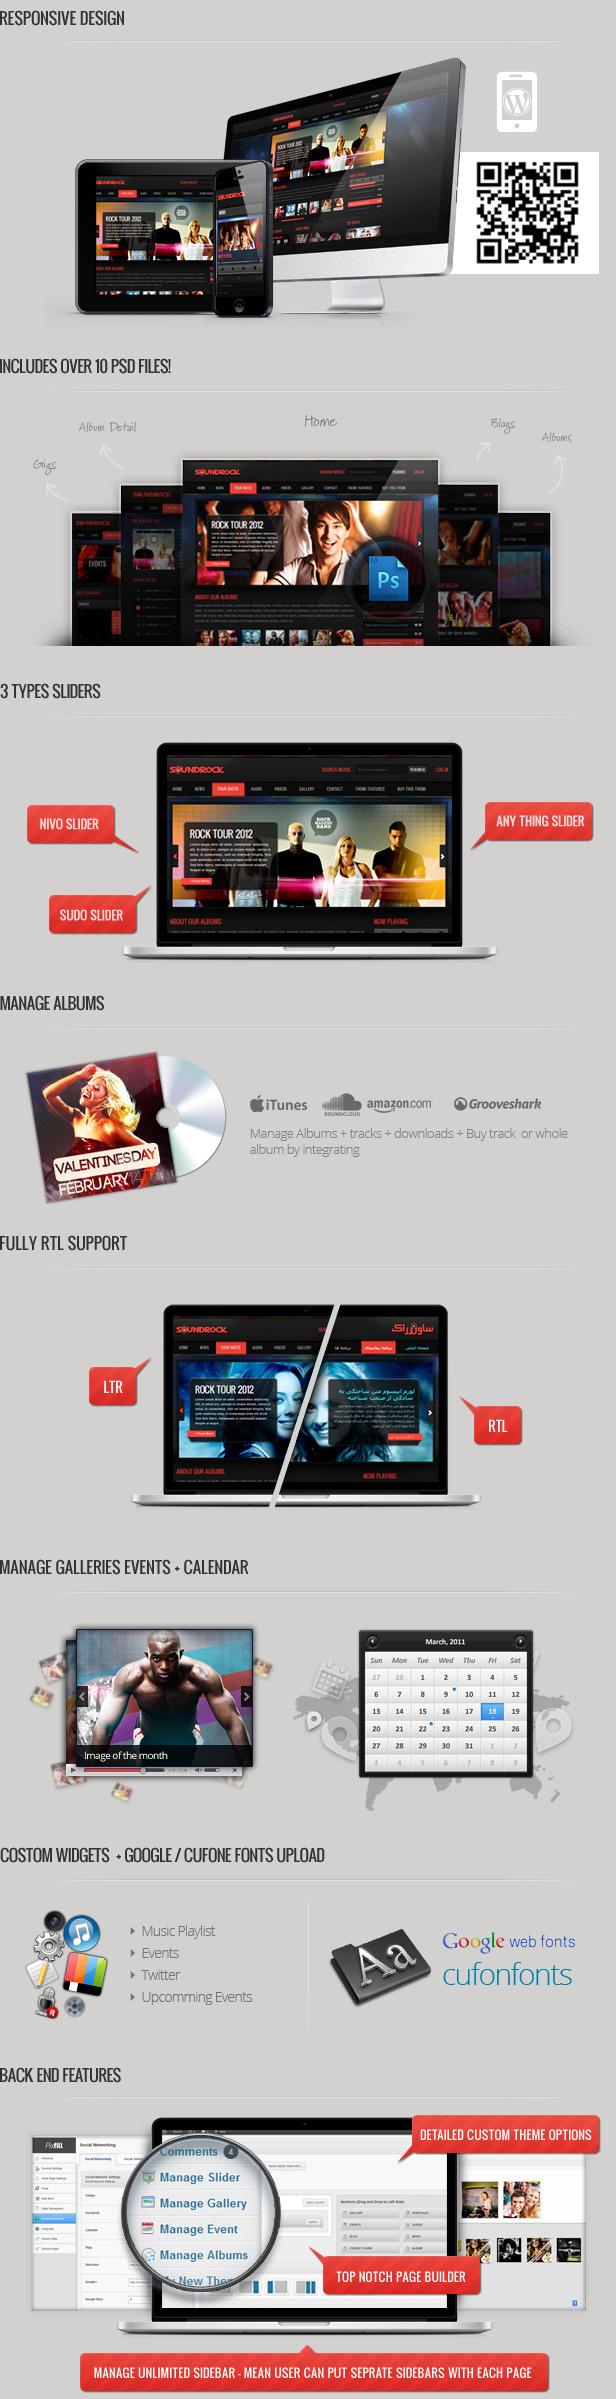 Sound Rock - Music Band Wordpress Theme by Chimpstudio | ThemeForest